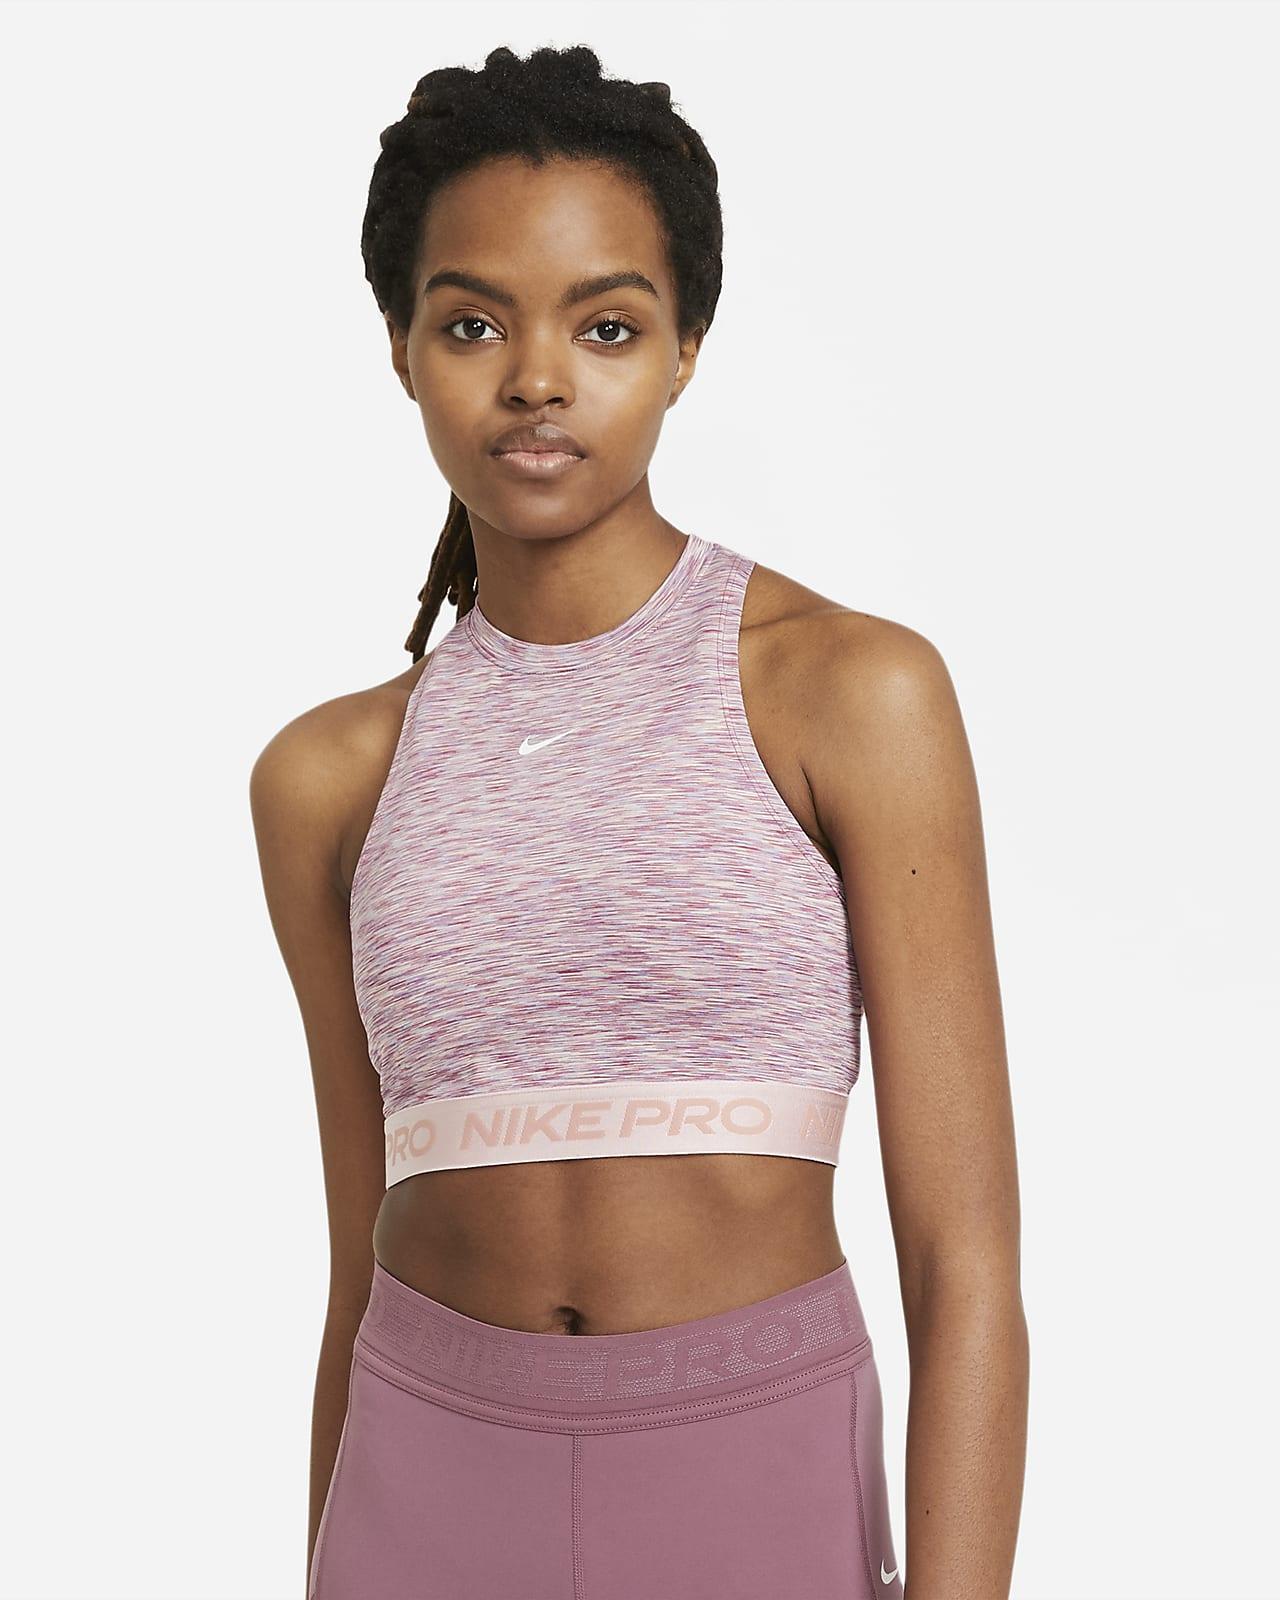 Nike Pro Space-Dye Camiseta de tirantes - Mujer